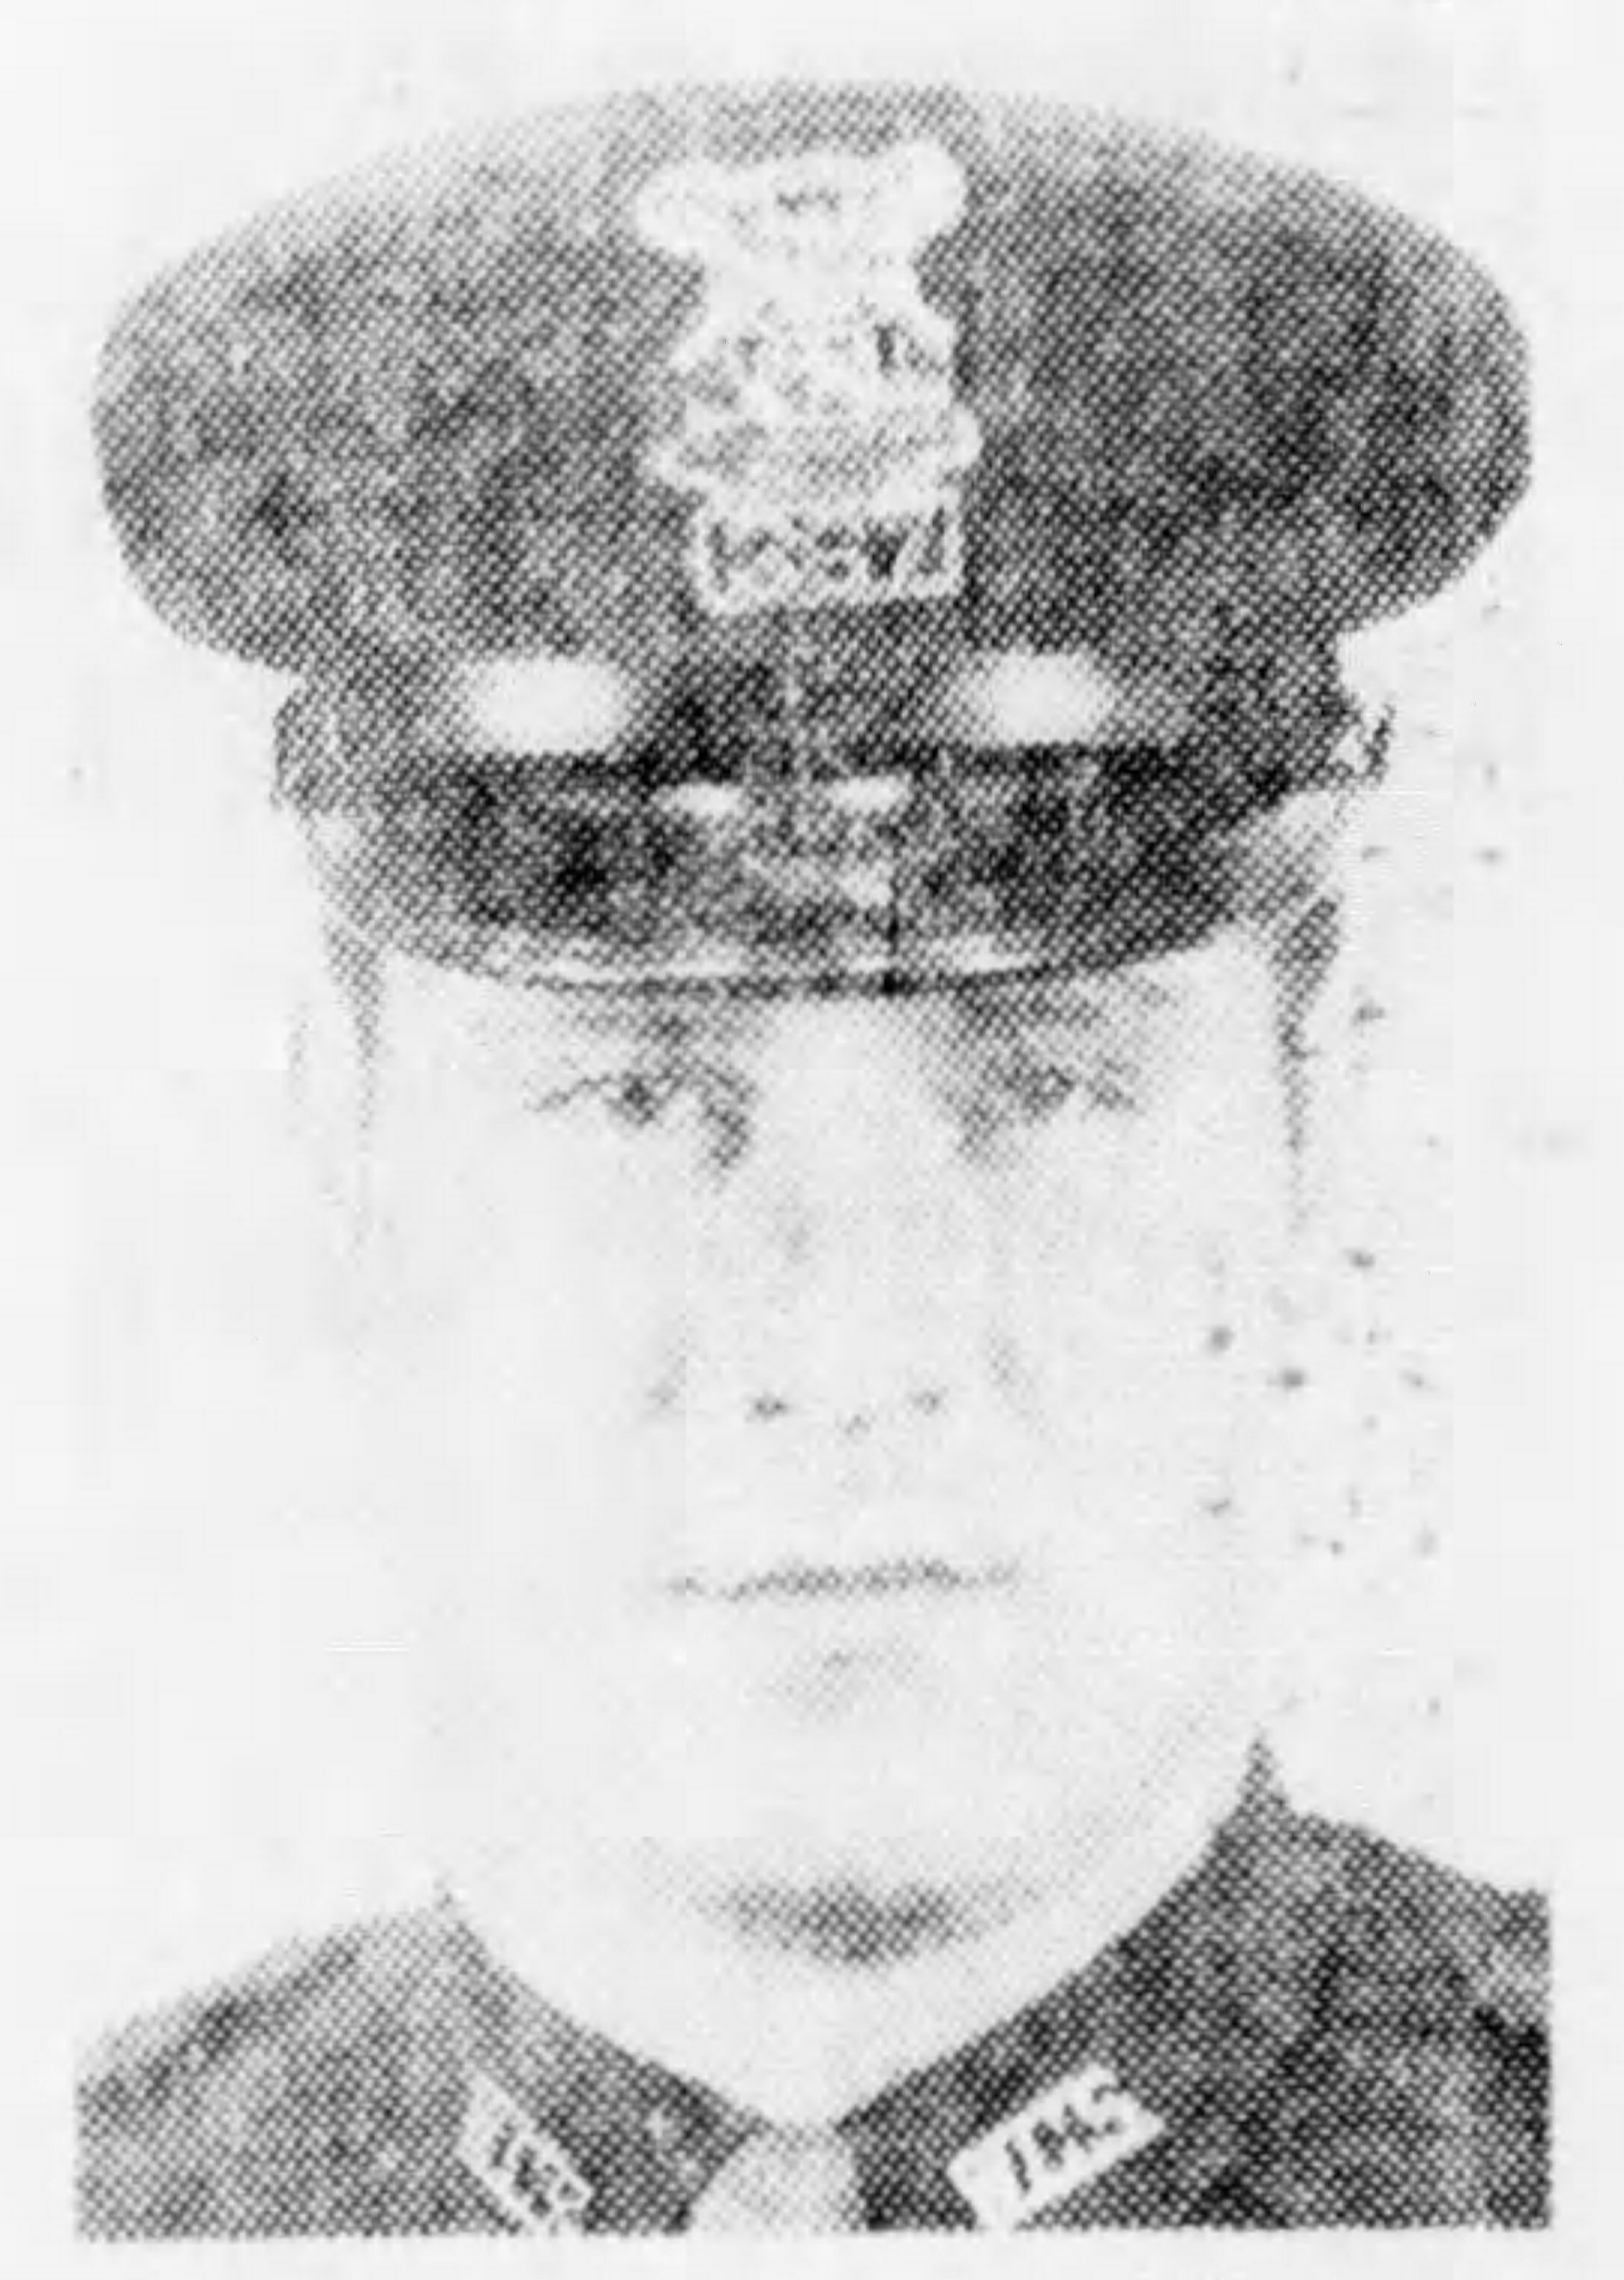 Deputy Sheriff Paul Lee Mickel | Wayne County Sheriff's Office, Michigan